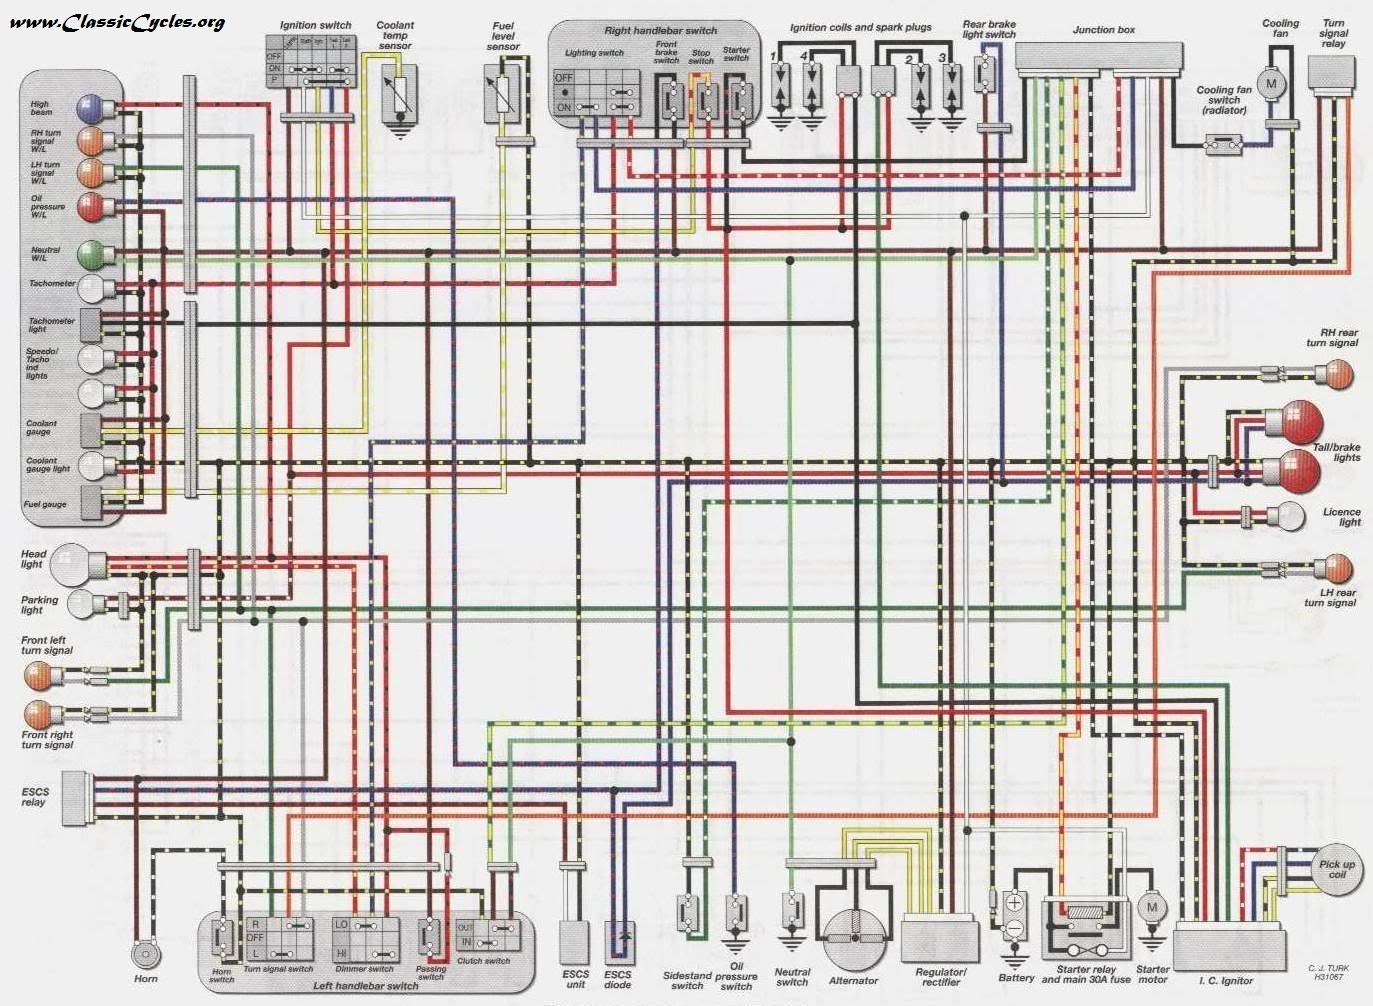 kawasaki 500 wiring diagram - wiring diagram school-warehouse -  school-warehouse.pasticceriagele.it  pasticceriagele.it